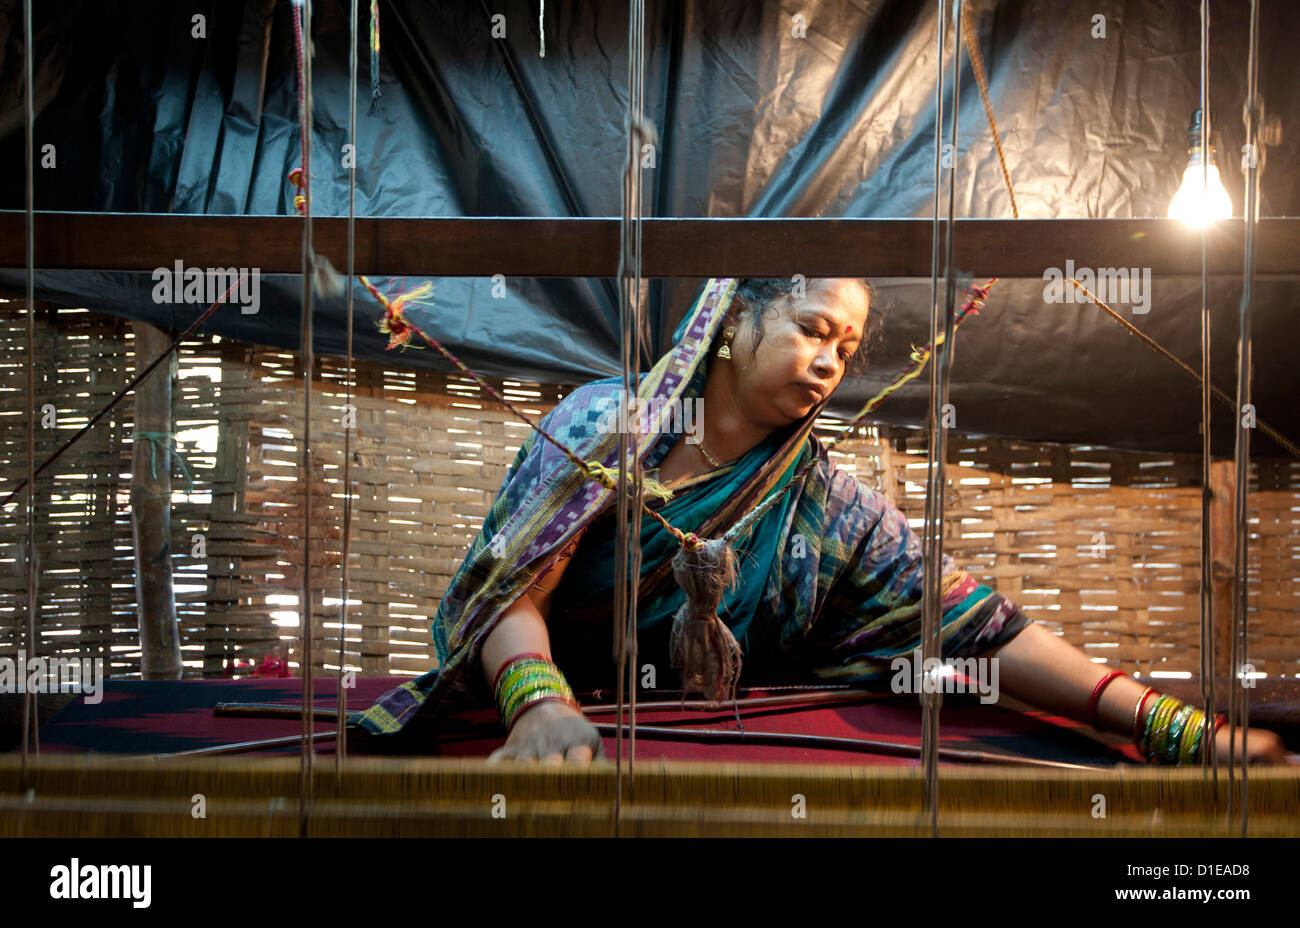 Woman in blue patterned sari weaving at loom in rough village shack, Naupatana weaving village, rural Orissa, India, - Stock Image